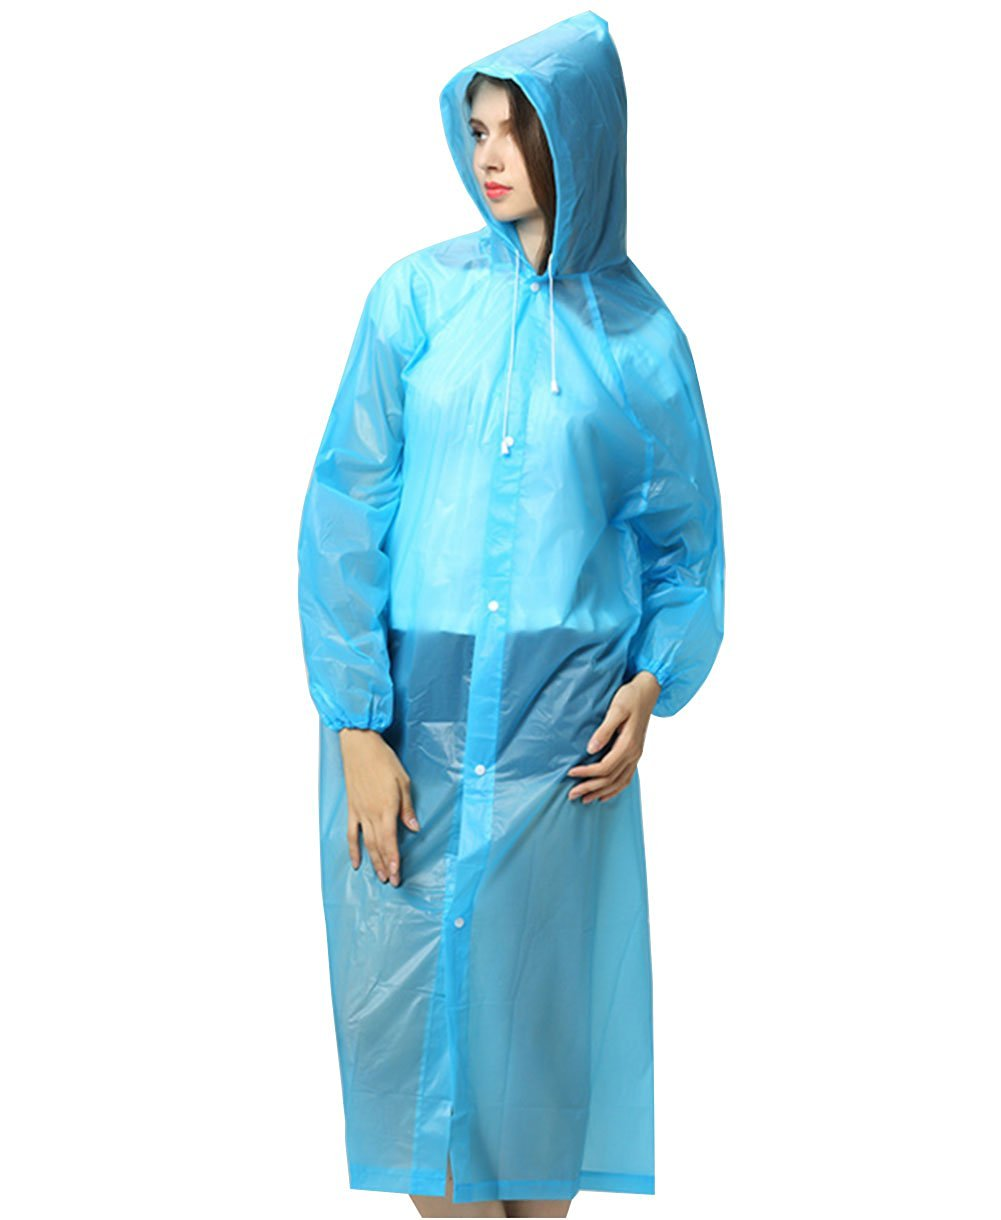 Motorbike Raincoat Full Cover Rain Cape Poncho Hooded Windproof Waterproof Rain Coat With Cap Men Women Cycling Motor Cover Elegant Appearance Exterior Accessories